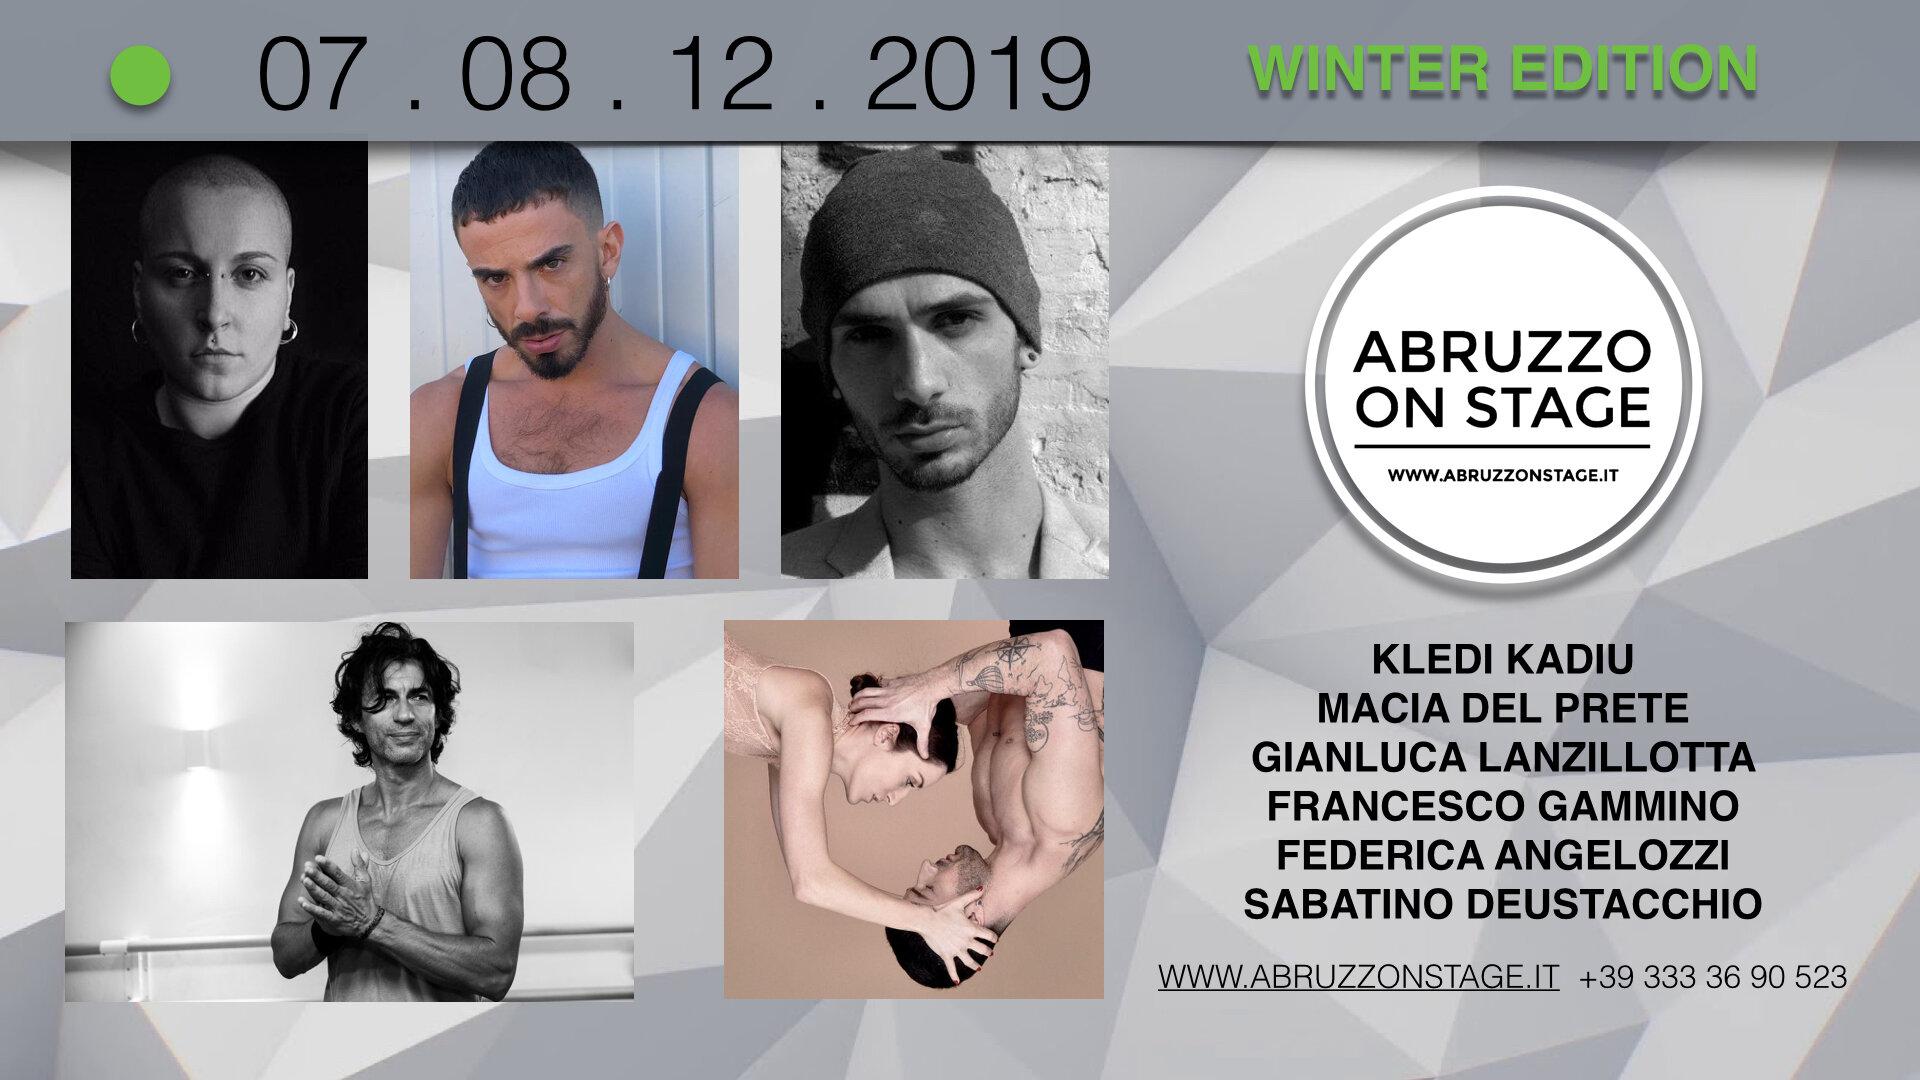 winter edition 2019 abruzzo ULTIMO.001.jpg